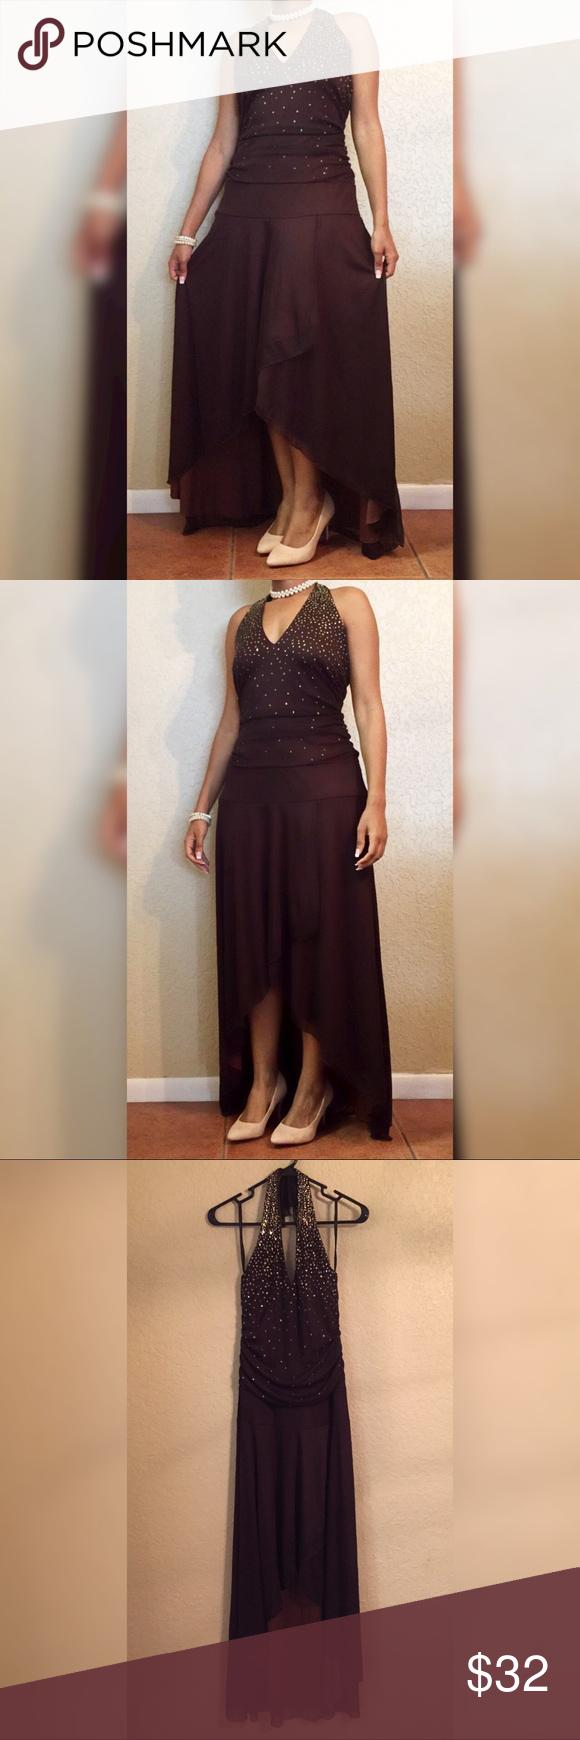 Cute promformal dark brown dress